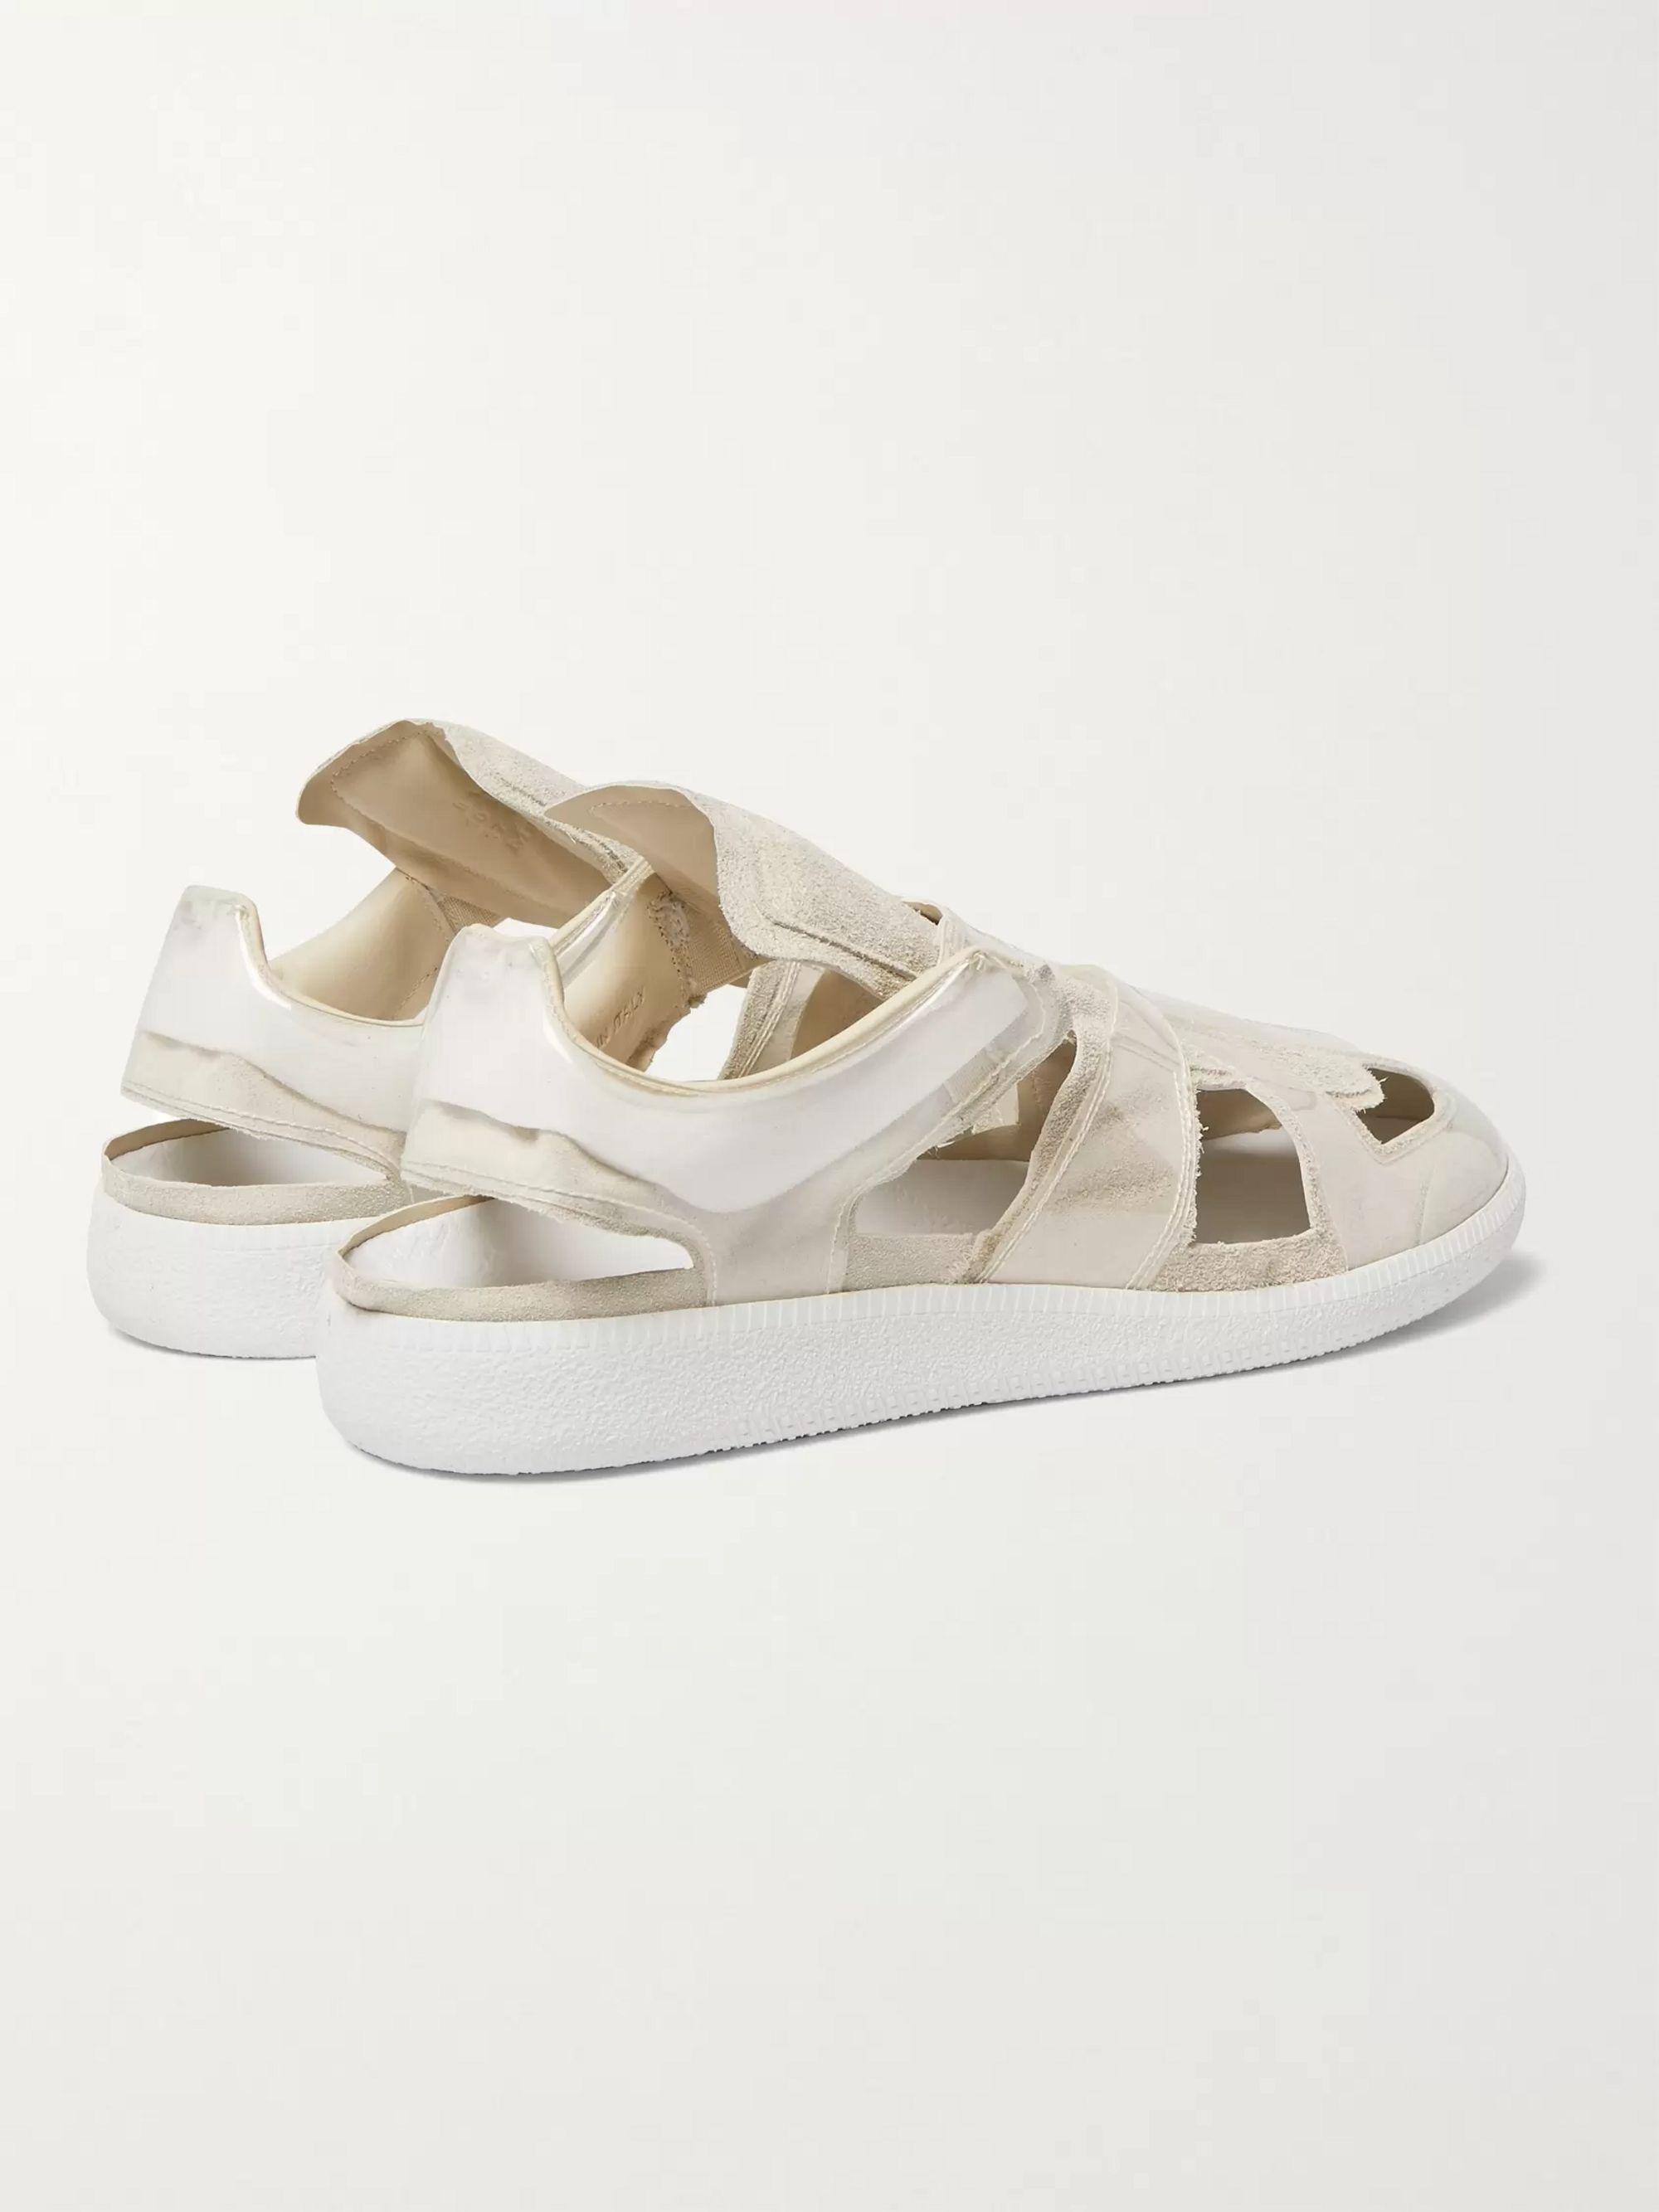 Maison Margiela Replica slip on sneakers Silver   Slip on